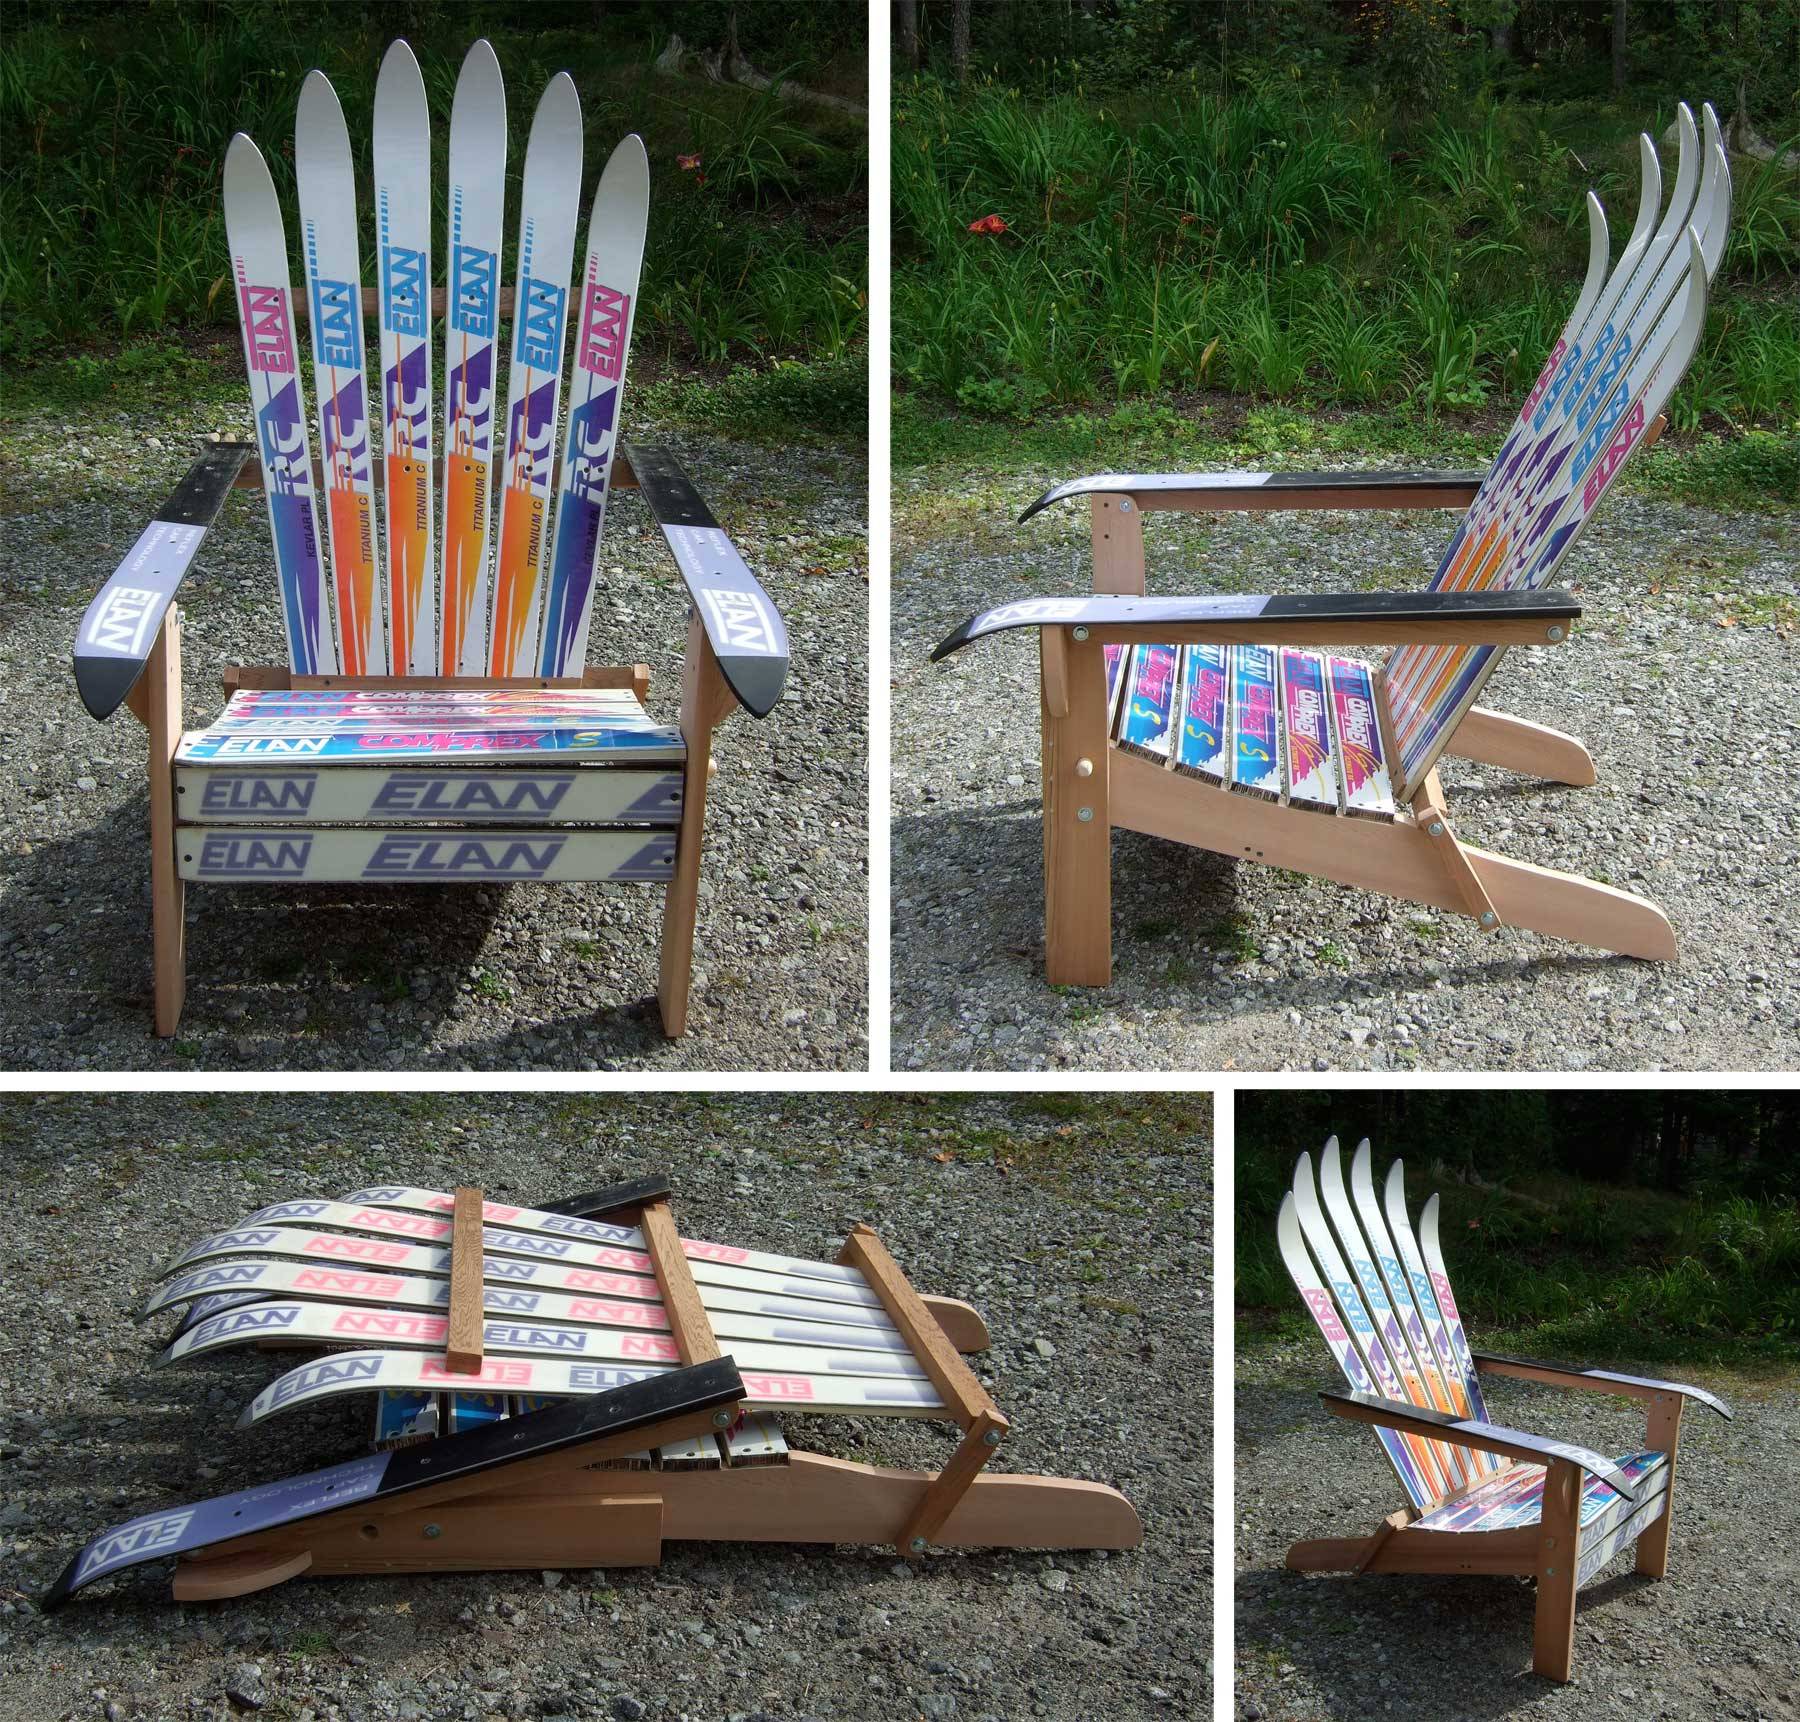 DIY Adirondack Chairs Plans  PDF How to make a water ski adirondack chair Plans DIY